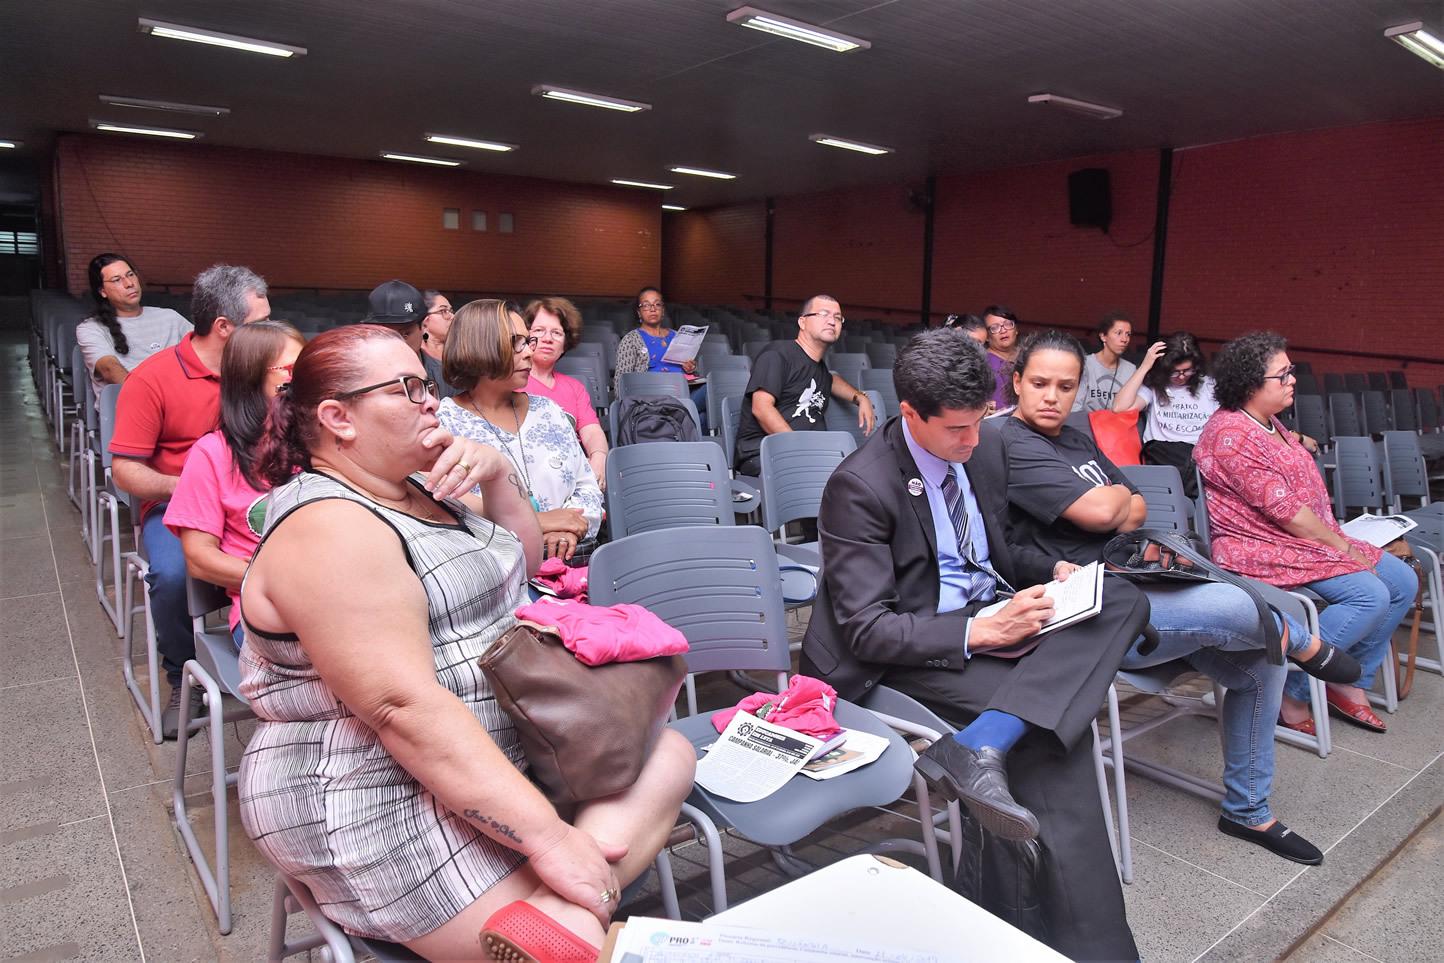 2019.04.11_Plenaria-de-Ceilandia_fotos-Joelma-Bomfim-4